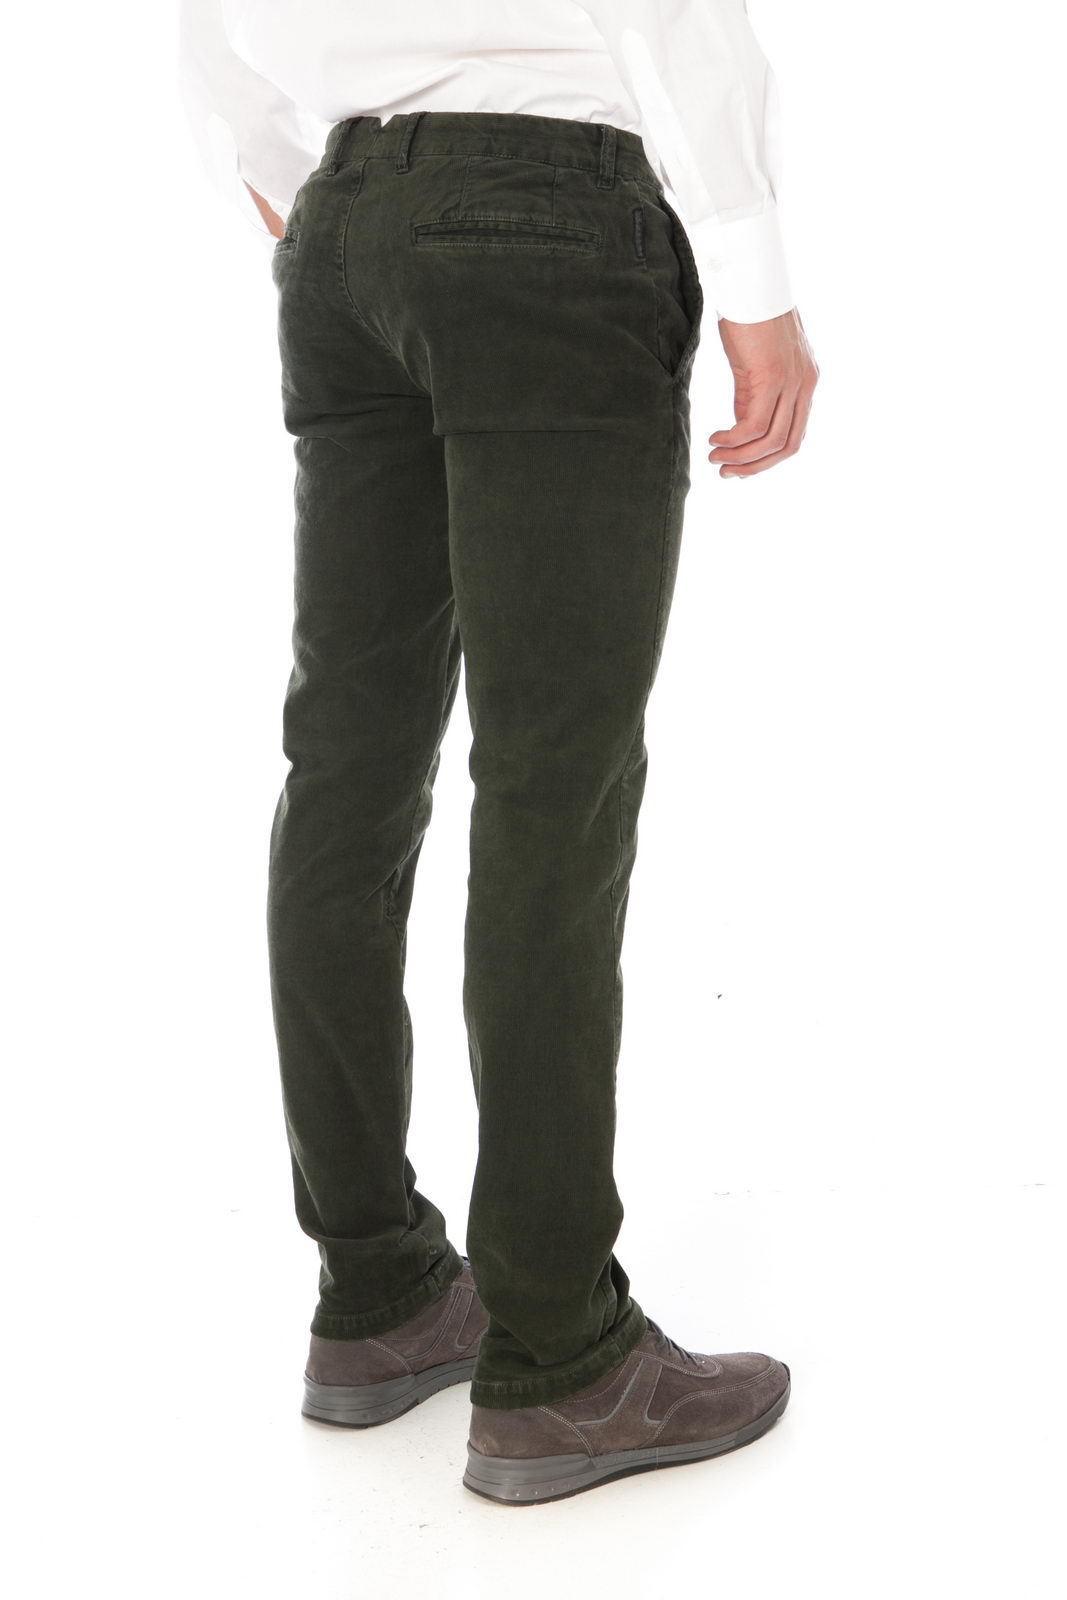 518ffdcfde Pantaloni Armani Jeans AJ Jeans Trouser Cotone Cotone Cotone Uomo ...